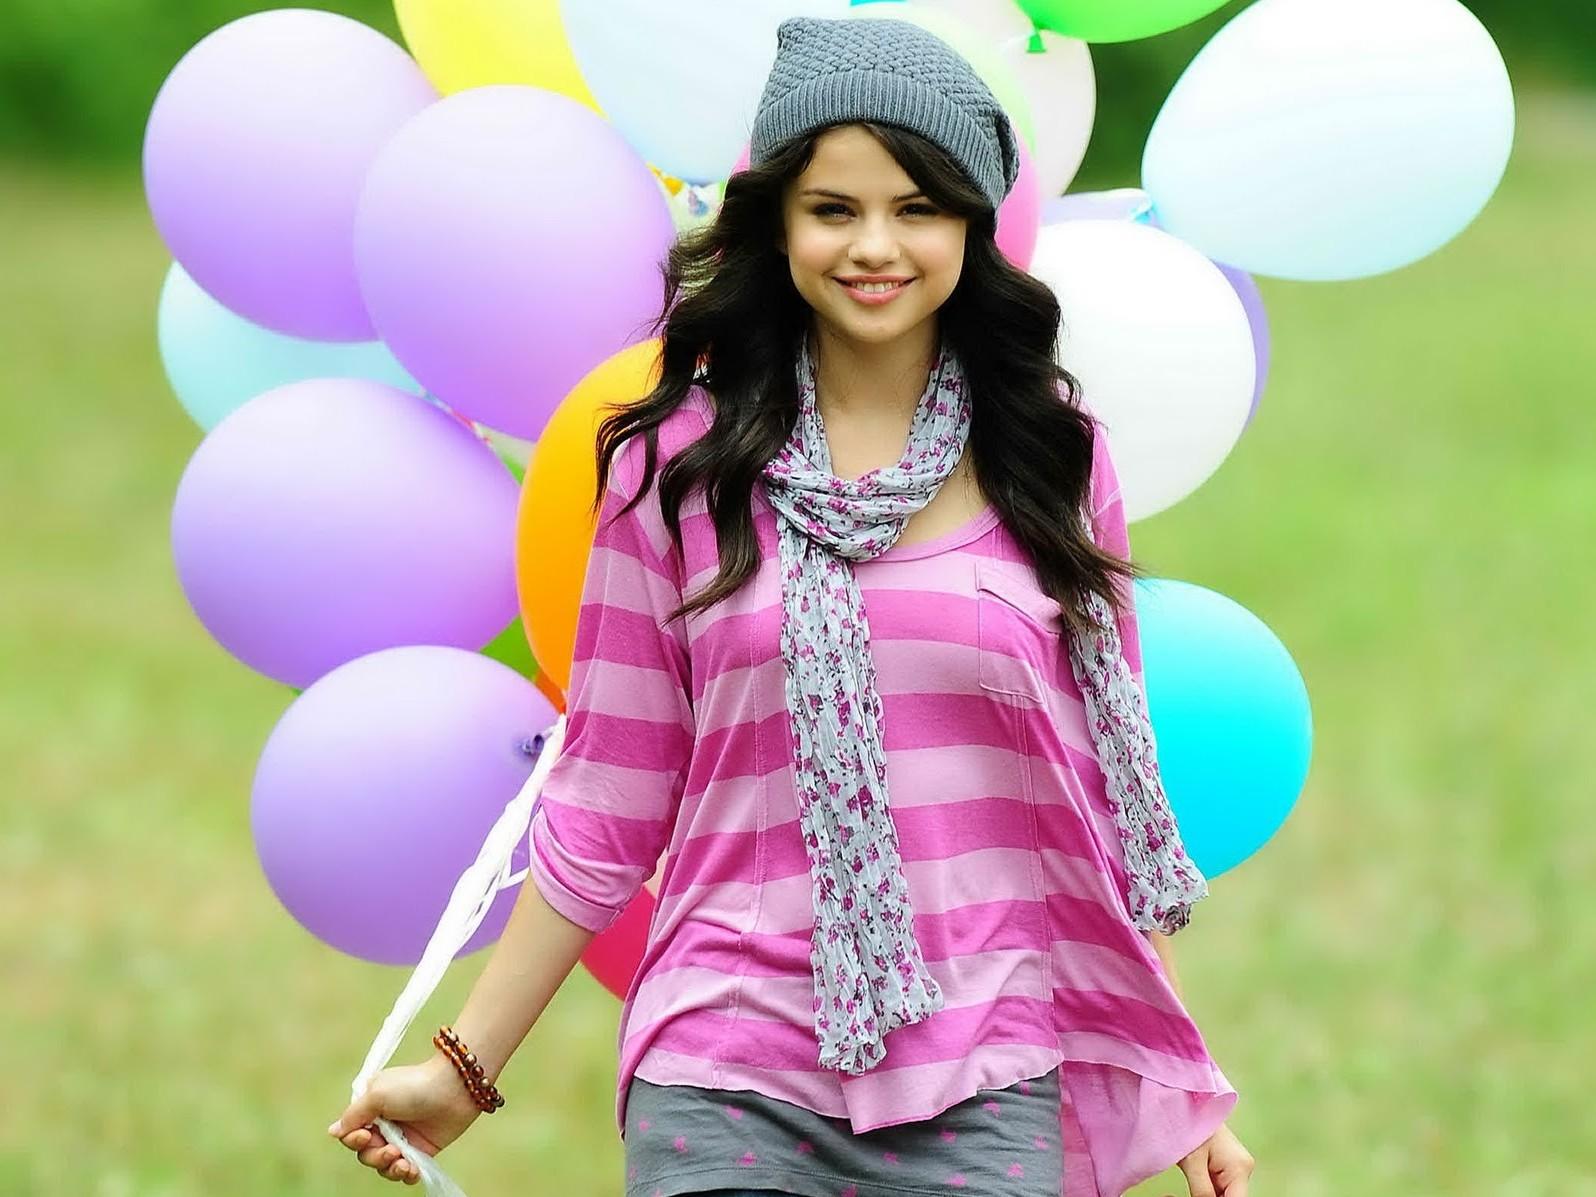 http://4.bp.blogspot.com/-JBclVVfBR7s/Tl9adBmhS_I/AAAAAAAABY4/9NzW-P_bYcs/s1600/Selena-Gomez-is-Pregnant-Photos-Wallpapers.jpg